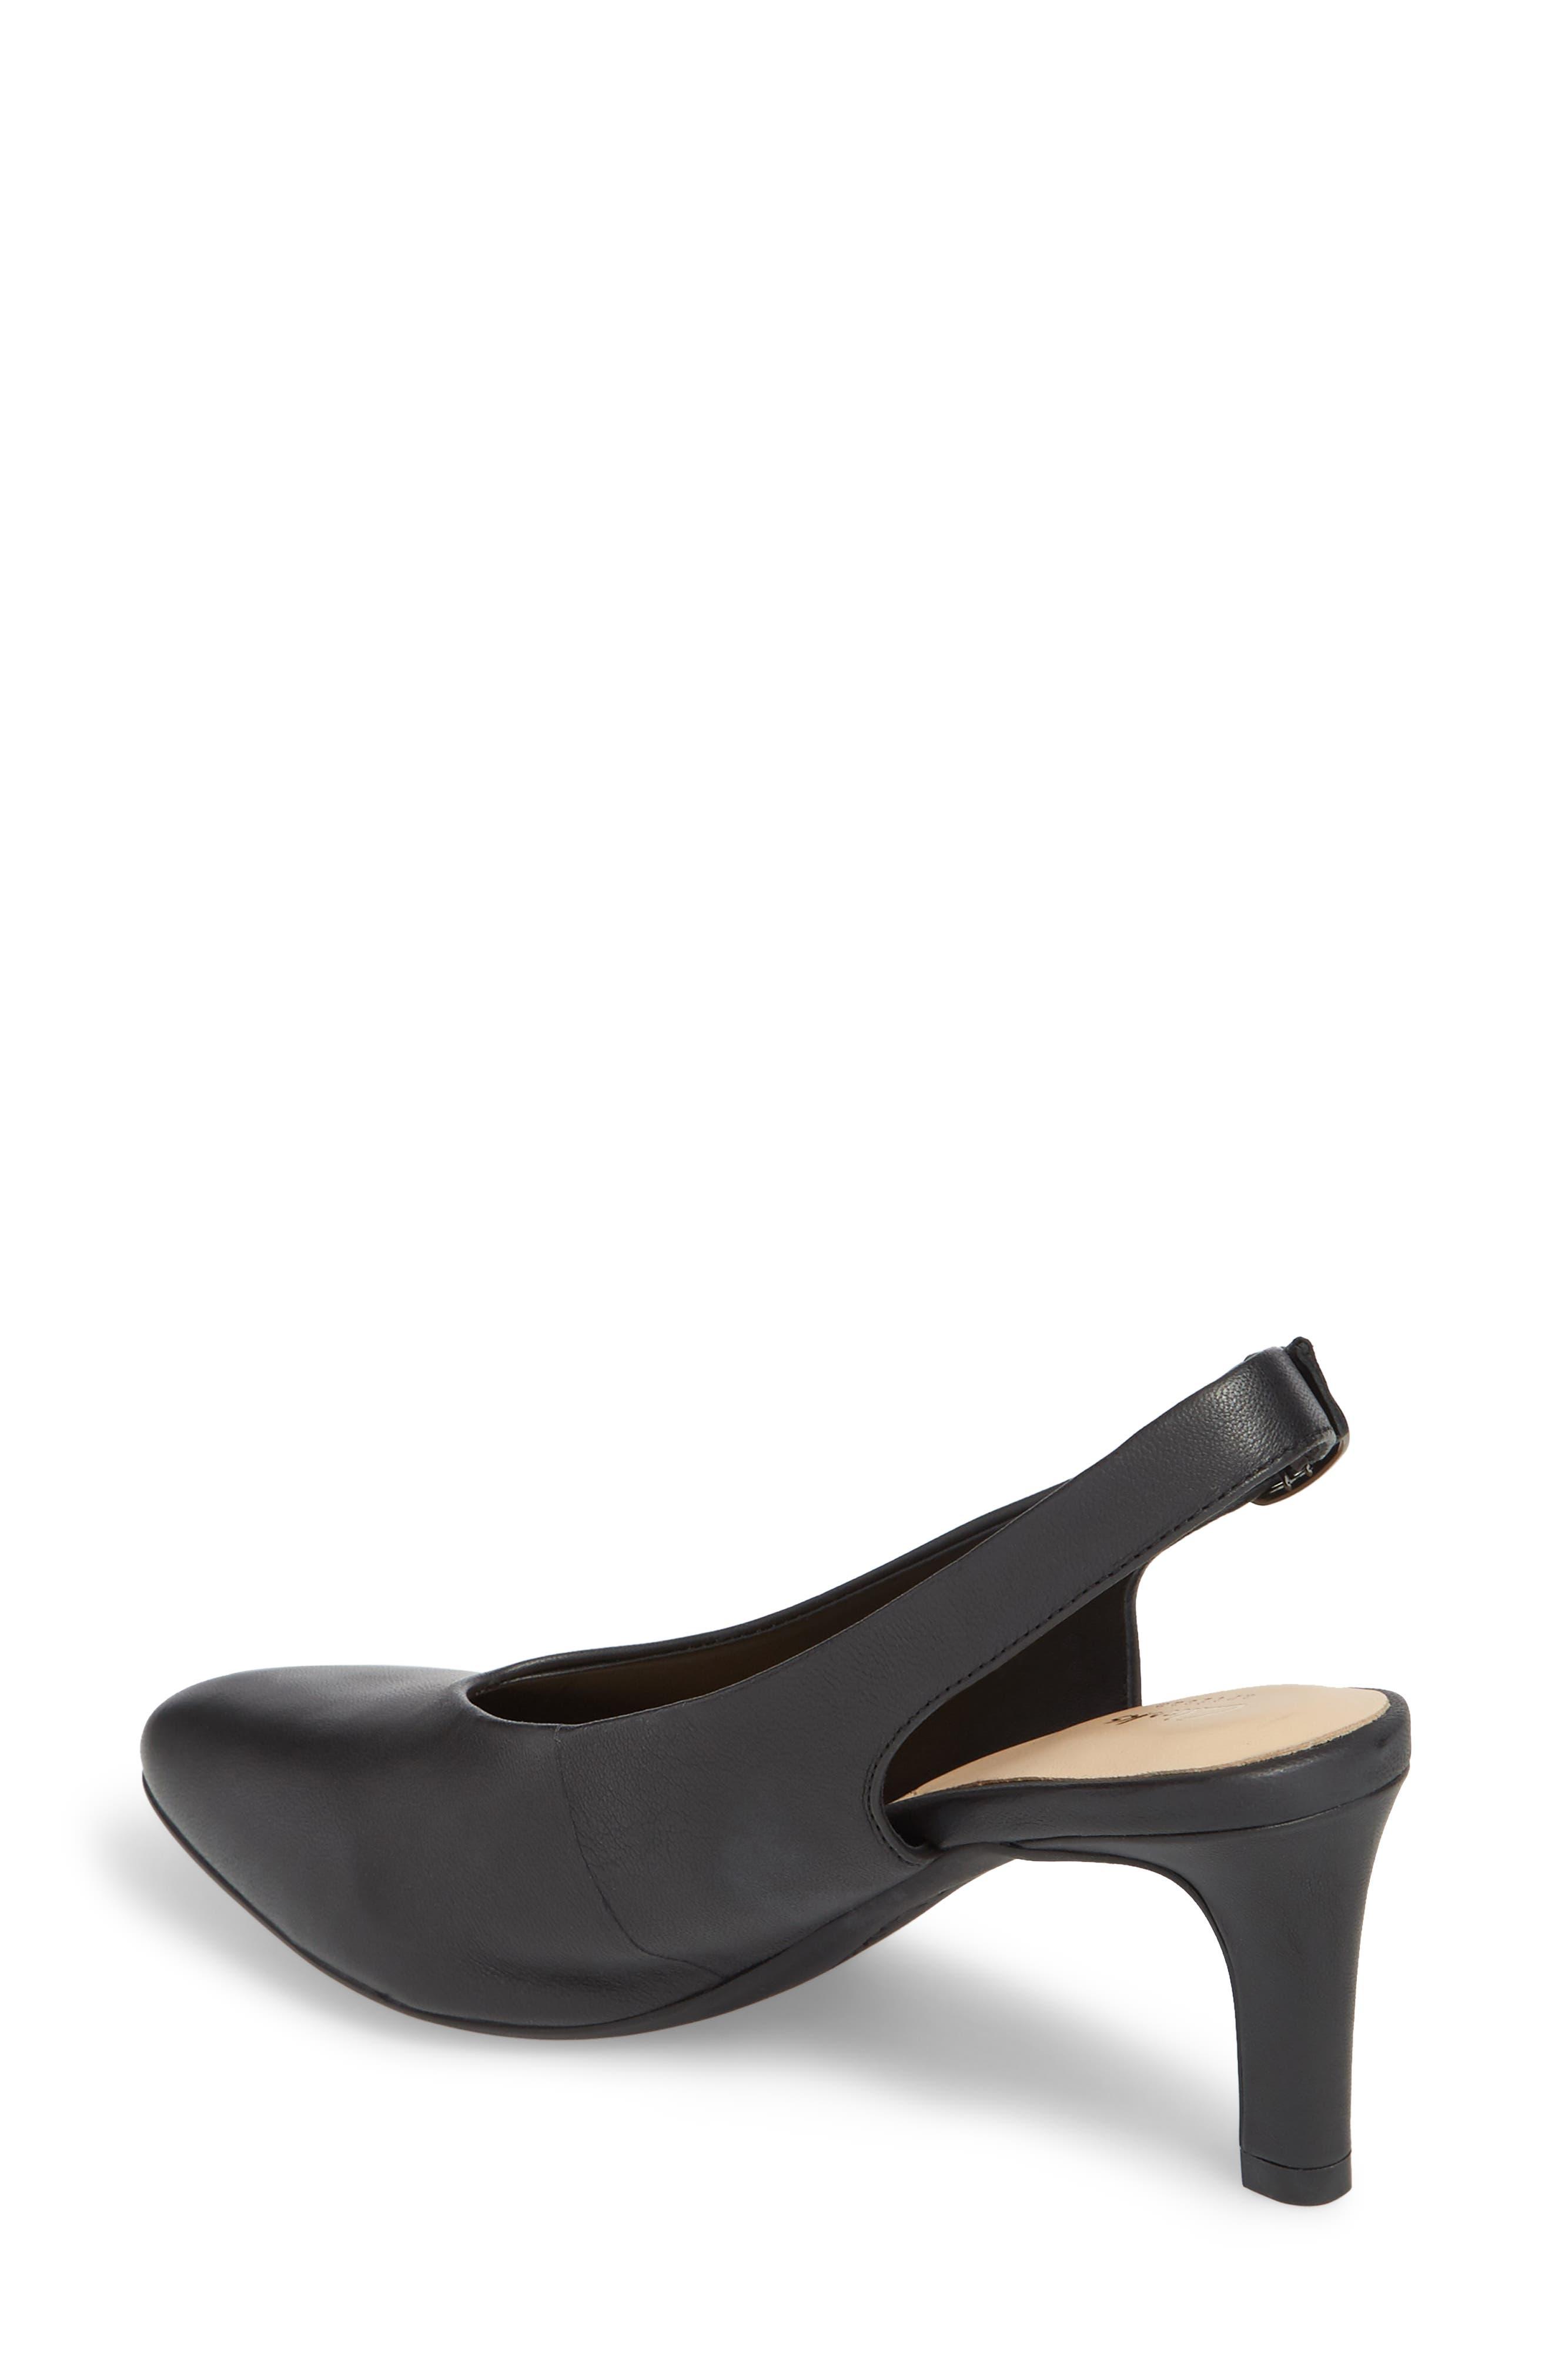 Calla Violet Kitten Heel Pump,                             Alternate thumbnail 2, color,                             Black Leather